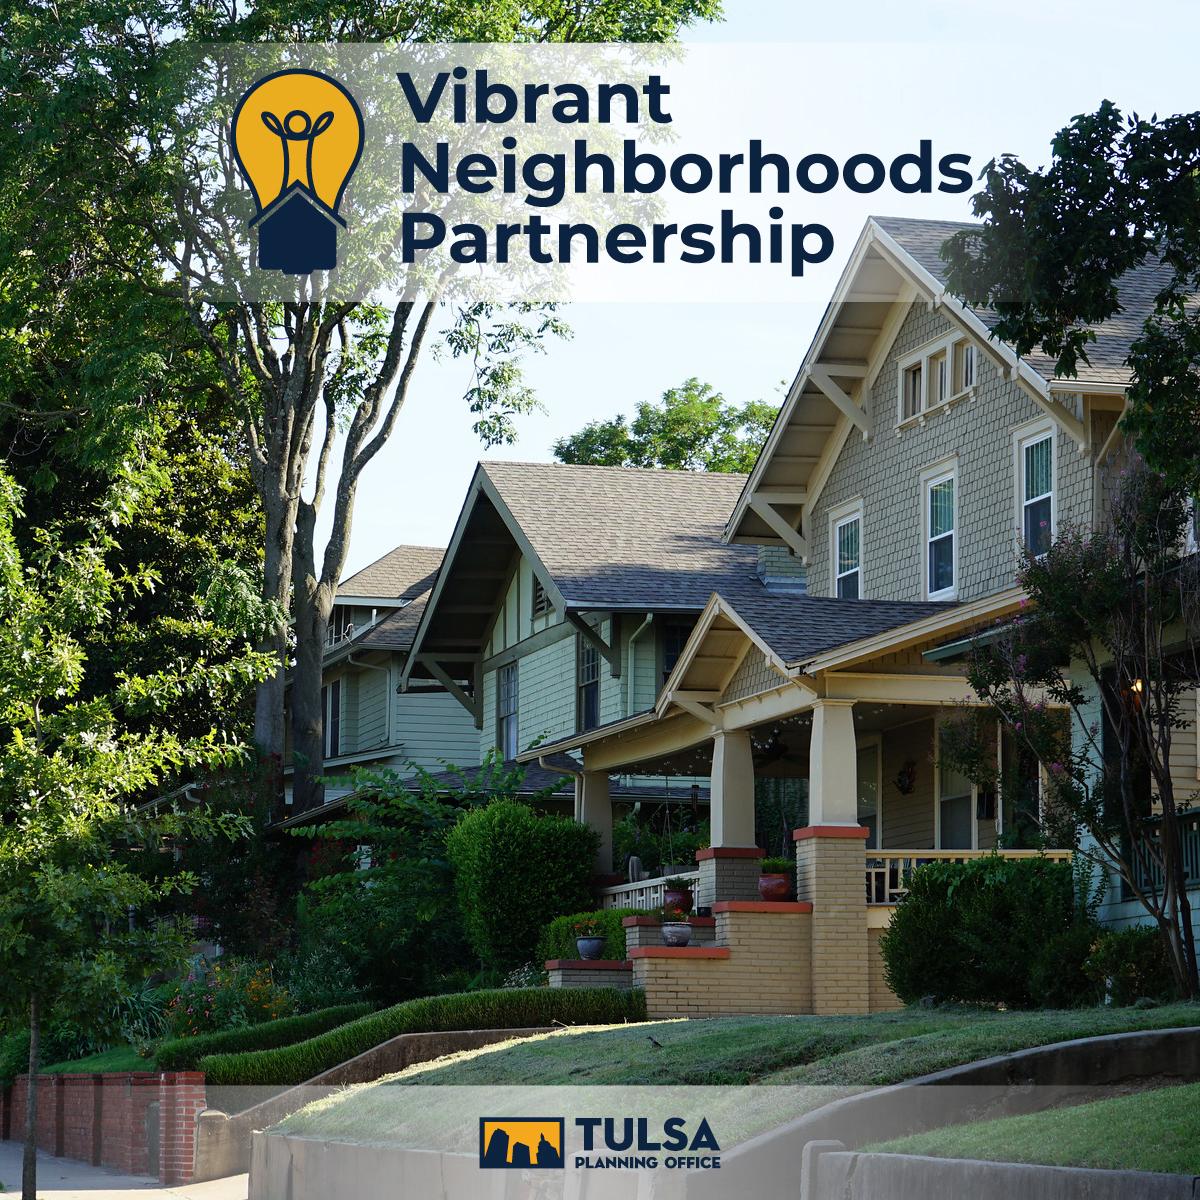 Vibrant Neighborhoods Partnership